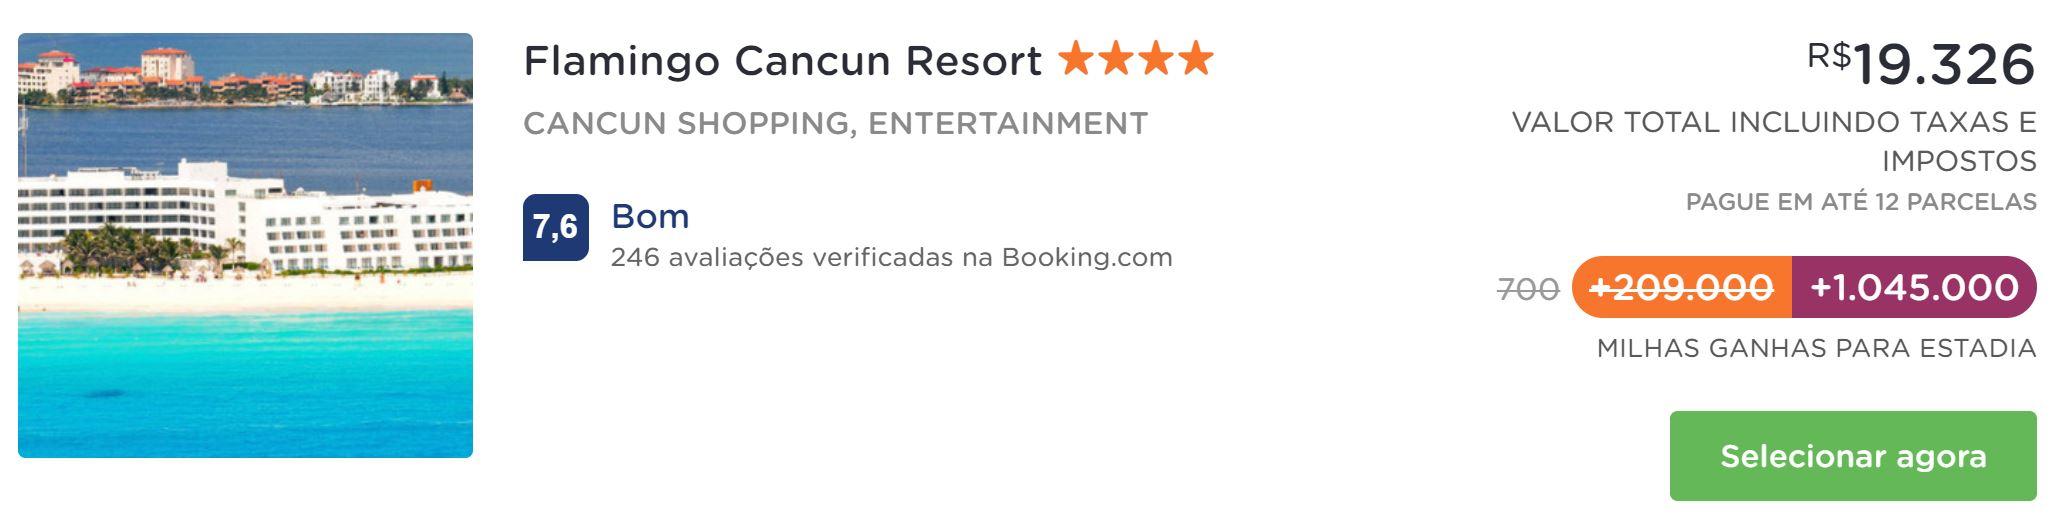 cancun-hotel-5-vezes-milhas-smiles-novembro-2017